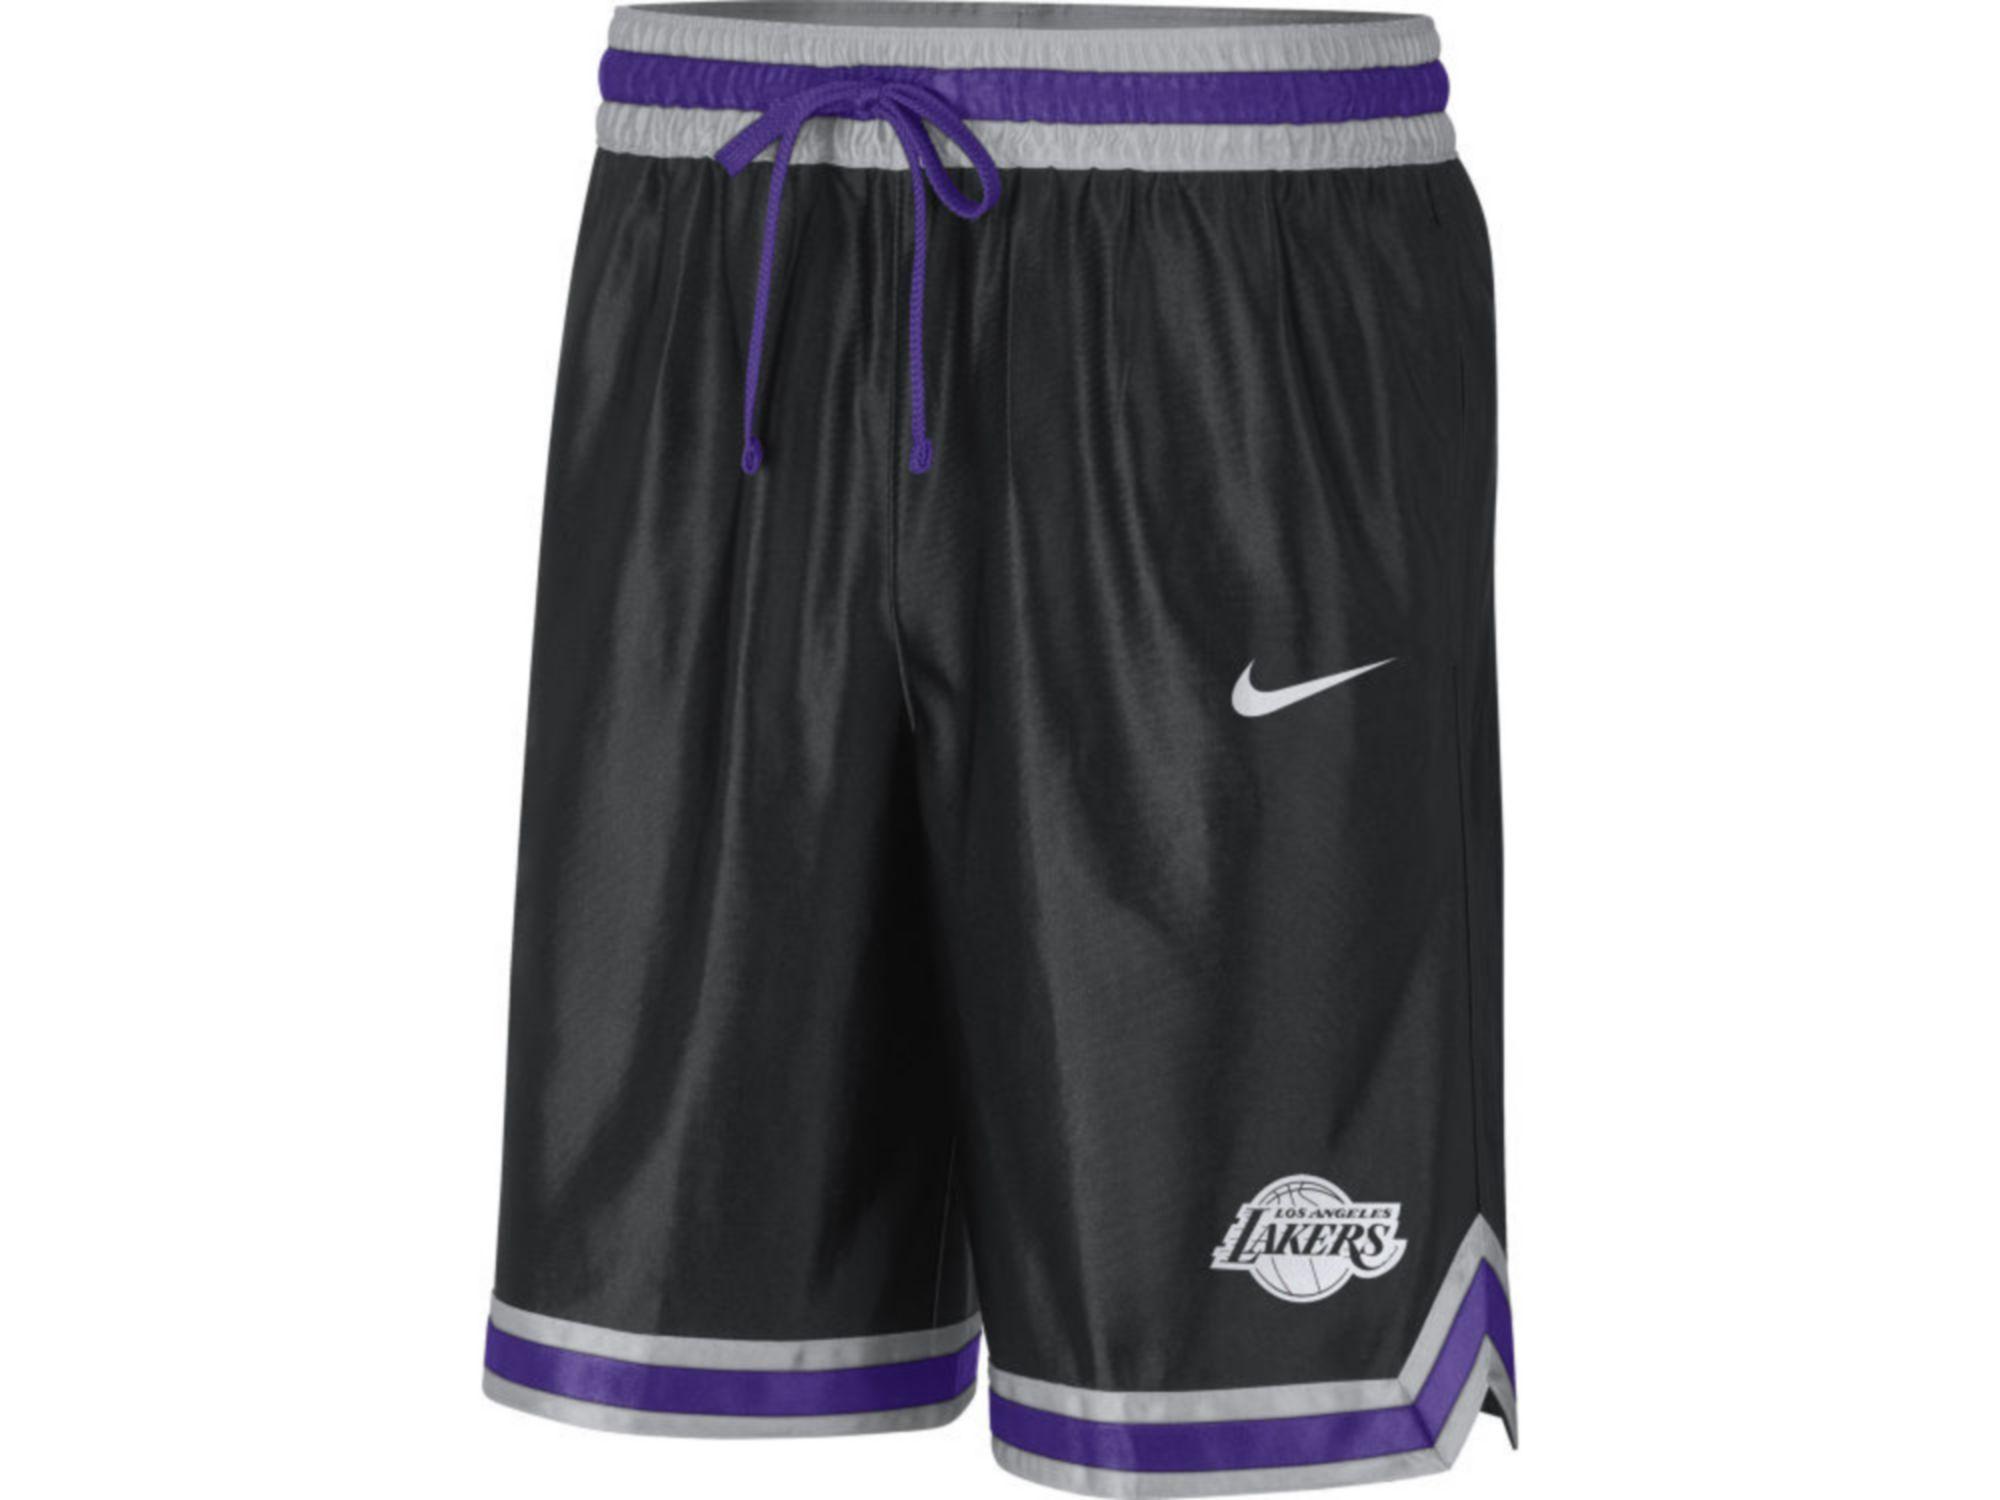 Nike Men's Los Angeles Lakers Chrome Courtside Shorts & Reviews - NBA - Sports Fan Shop - Macy's